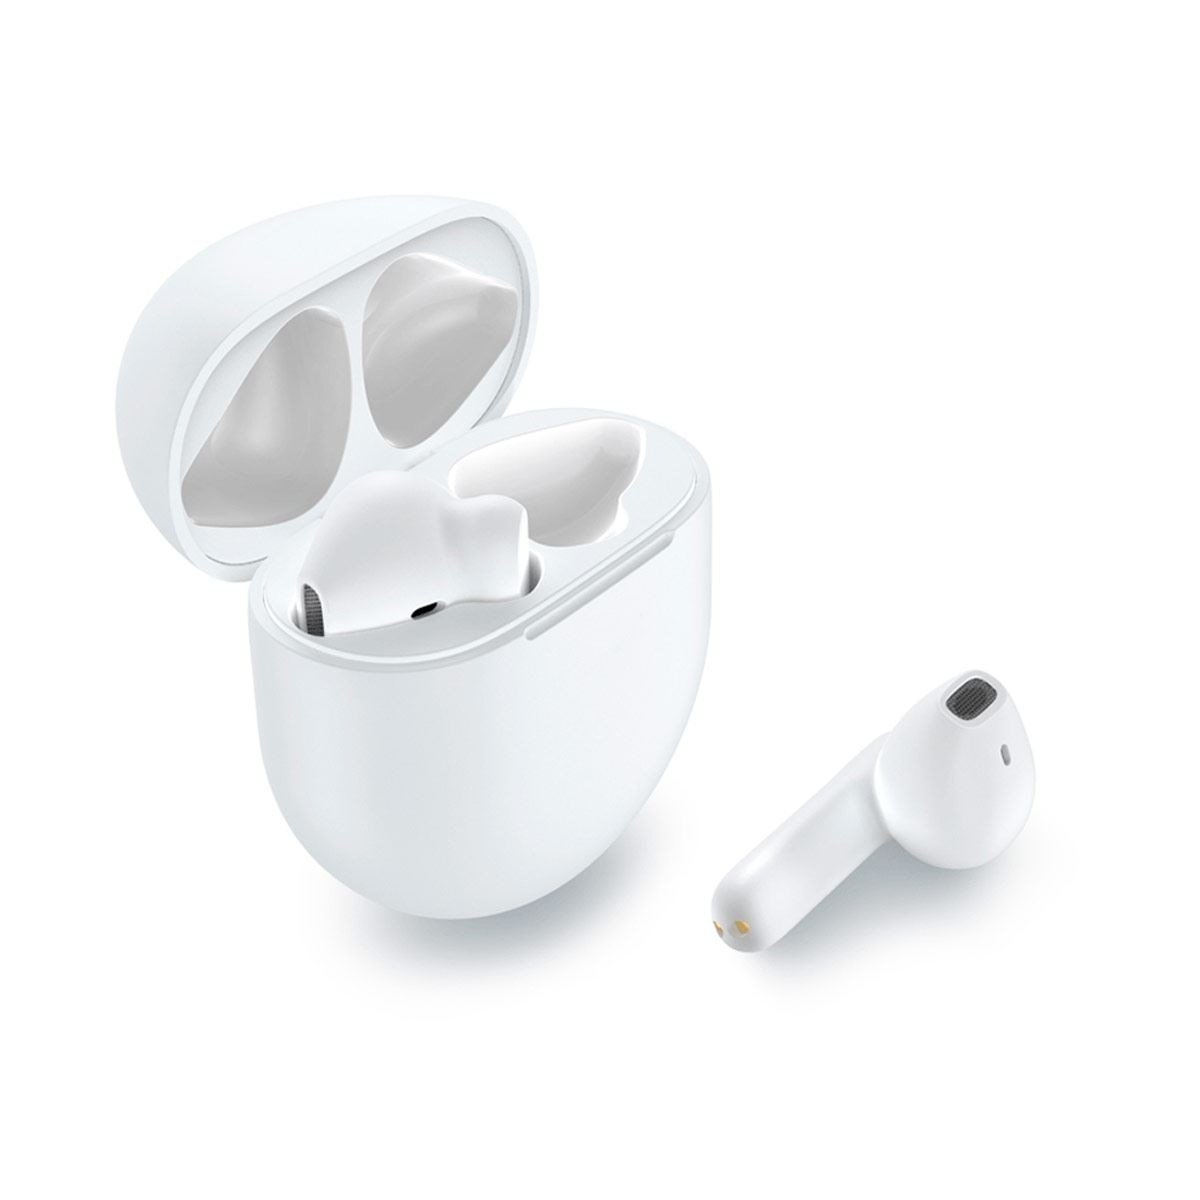 Audífonos Inalámbricos Zeta Blancos